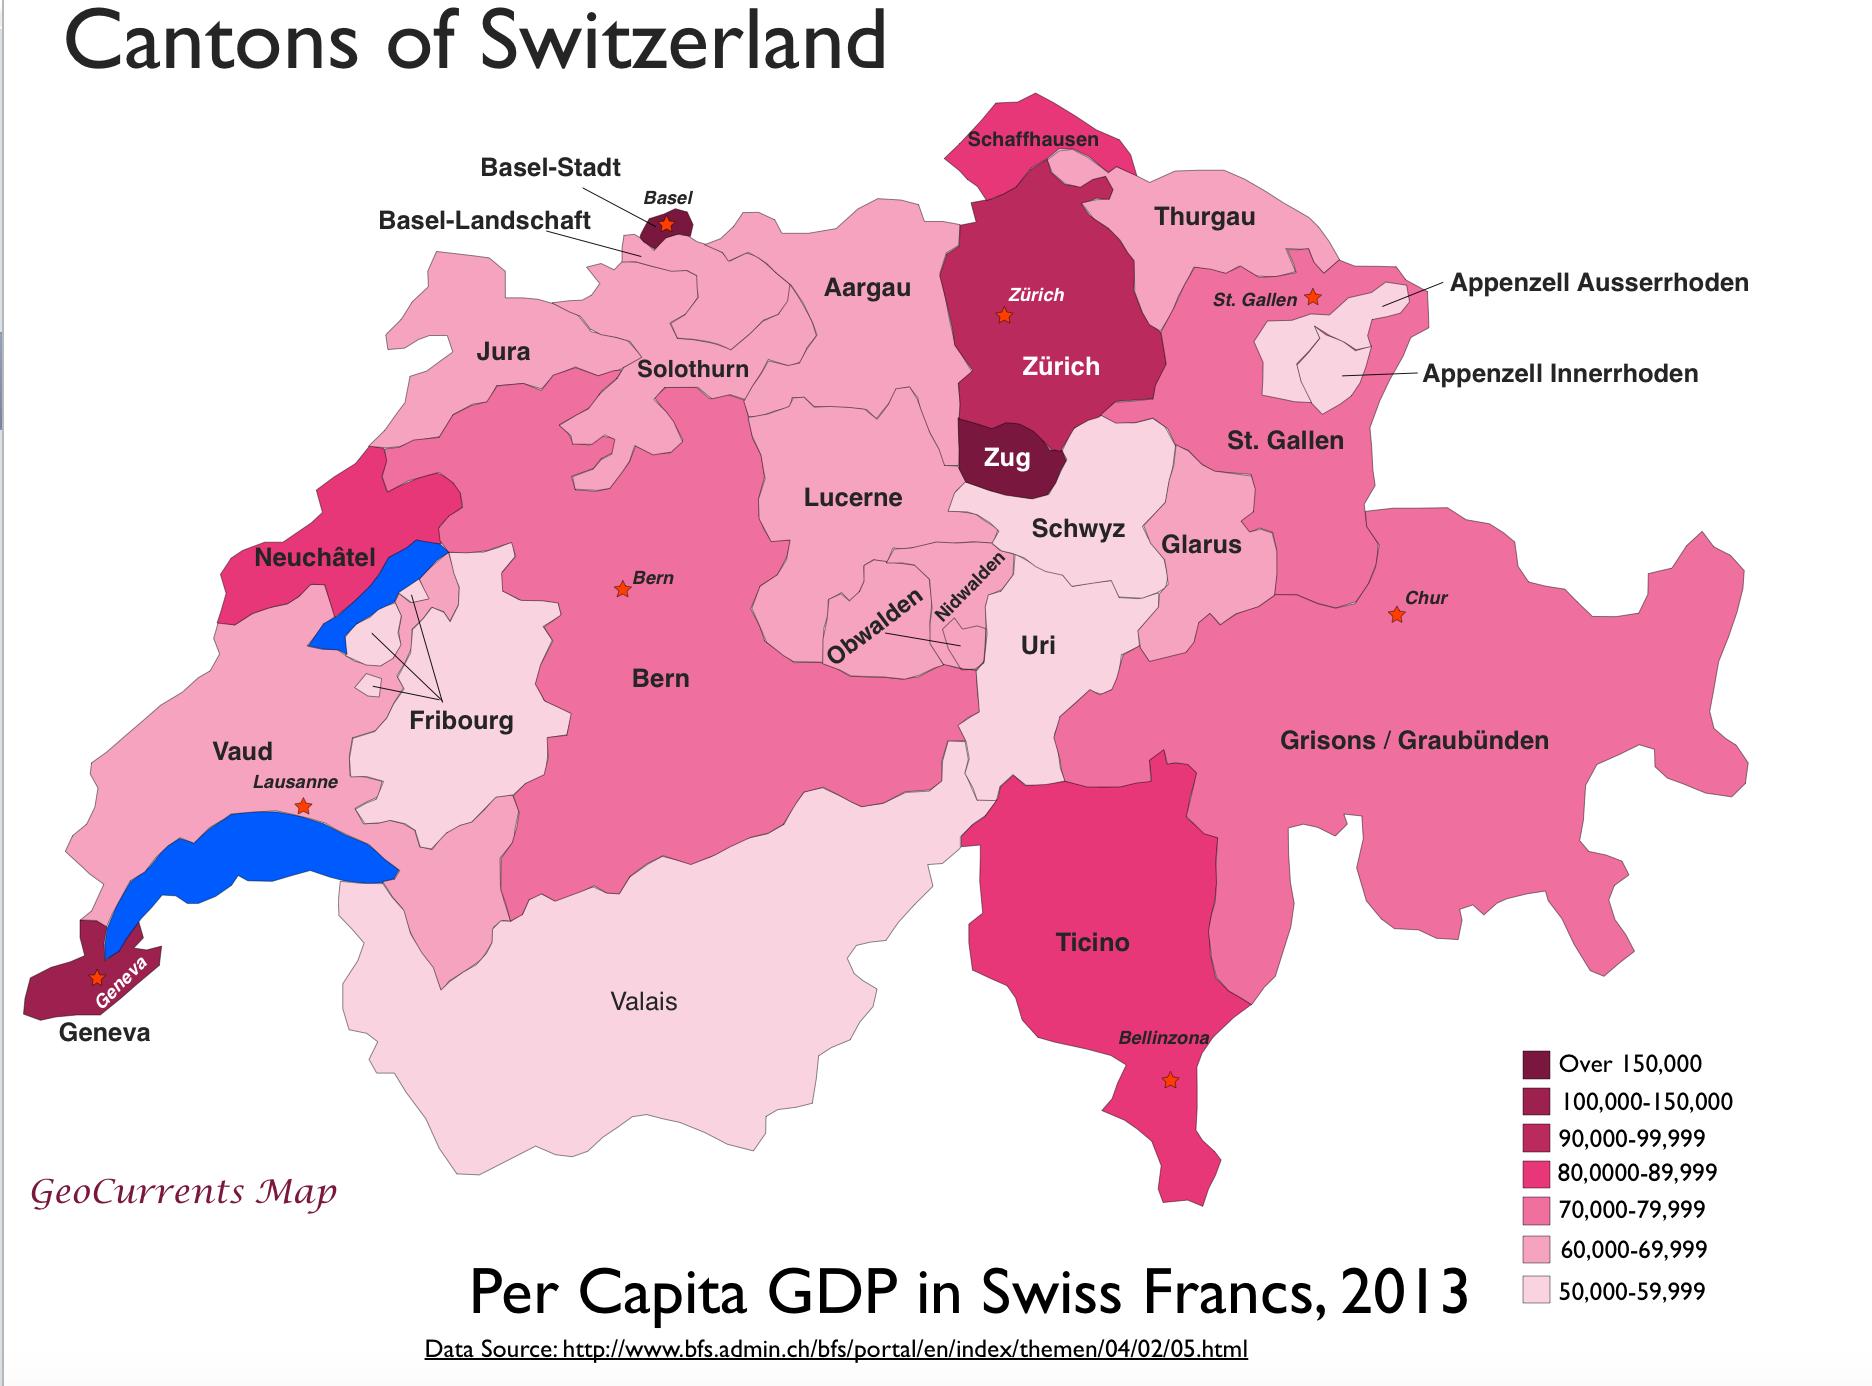 Swiss Per Capita GDP by Canton MAPS Pinterest